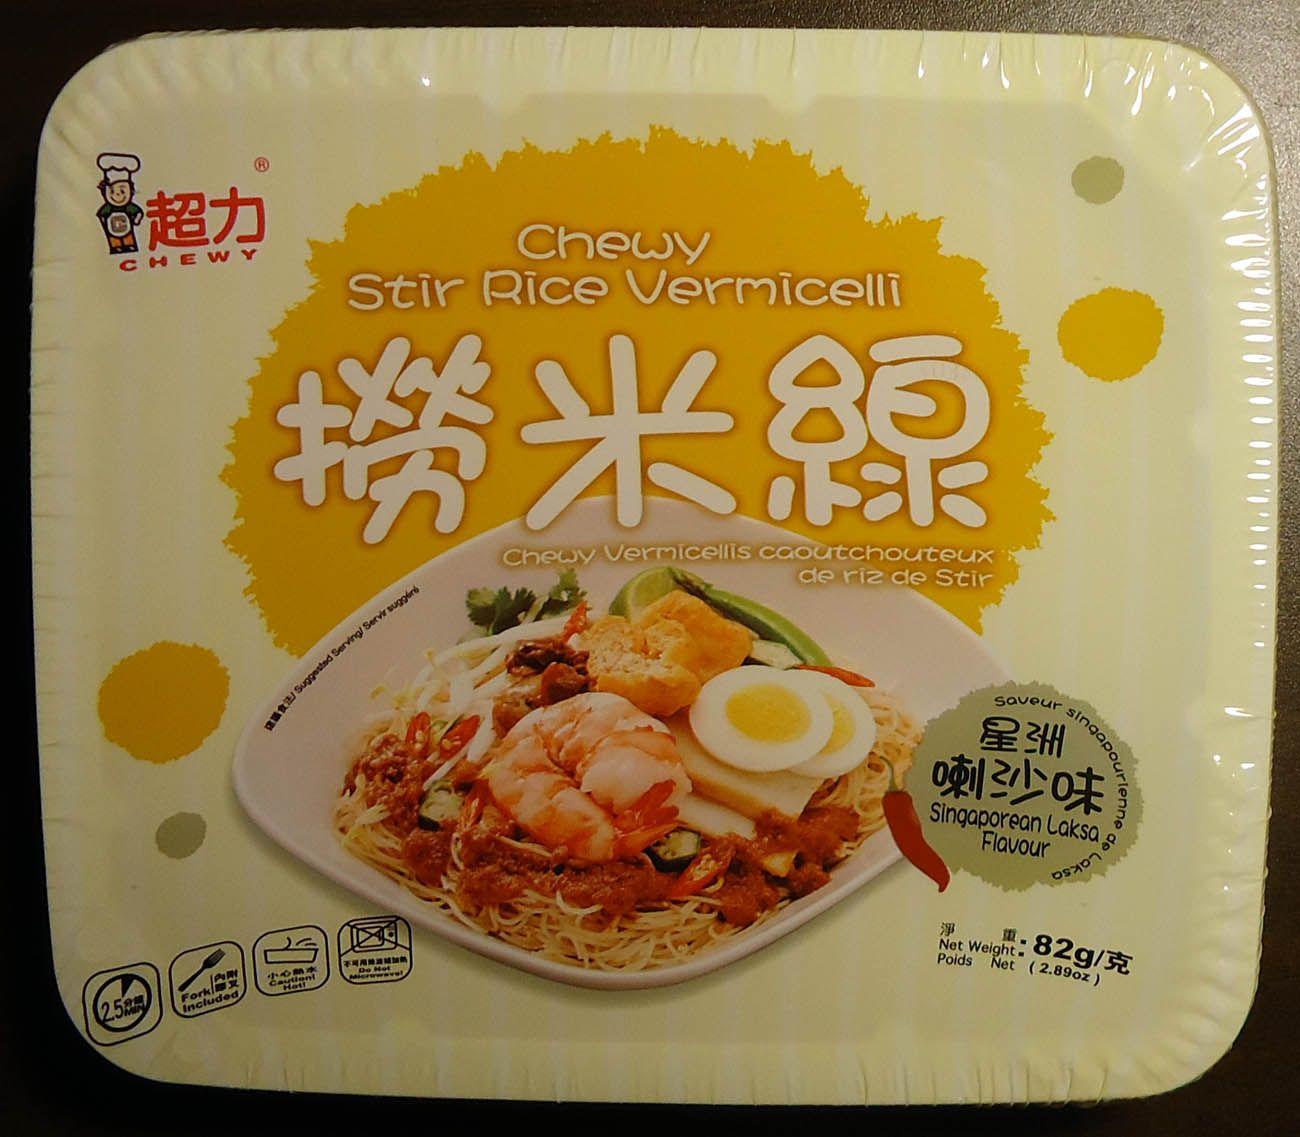 840 Chewy Stir Rice Vermicelli Singaporean Laksa Flavour